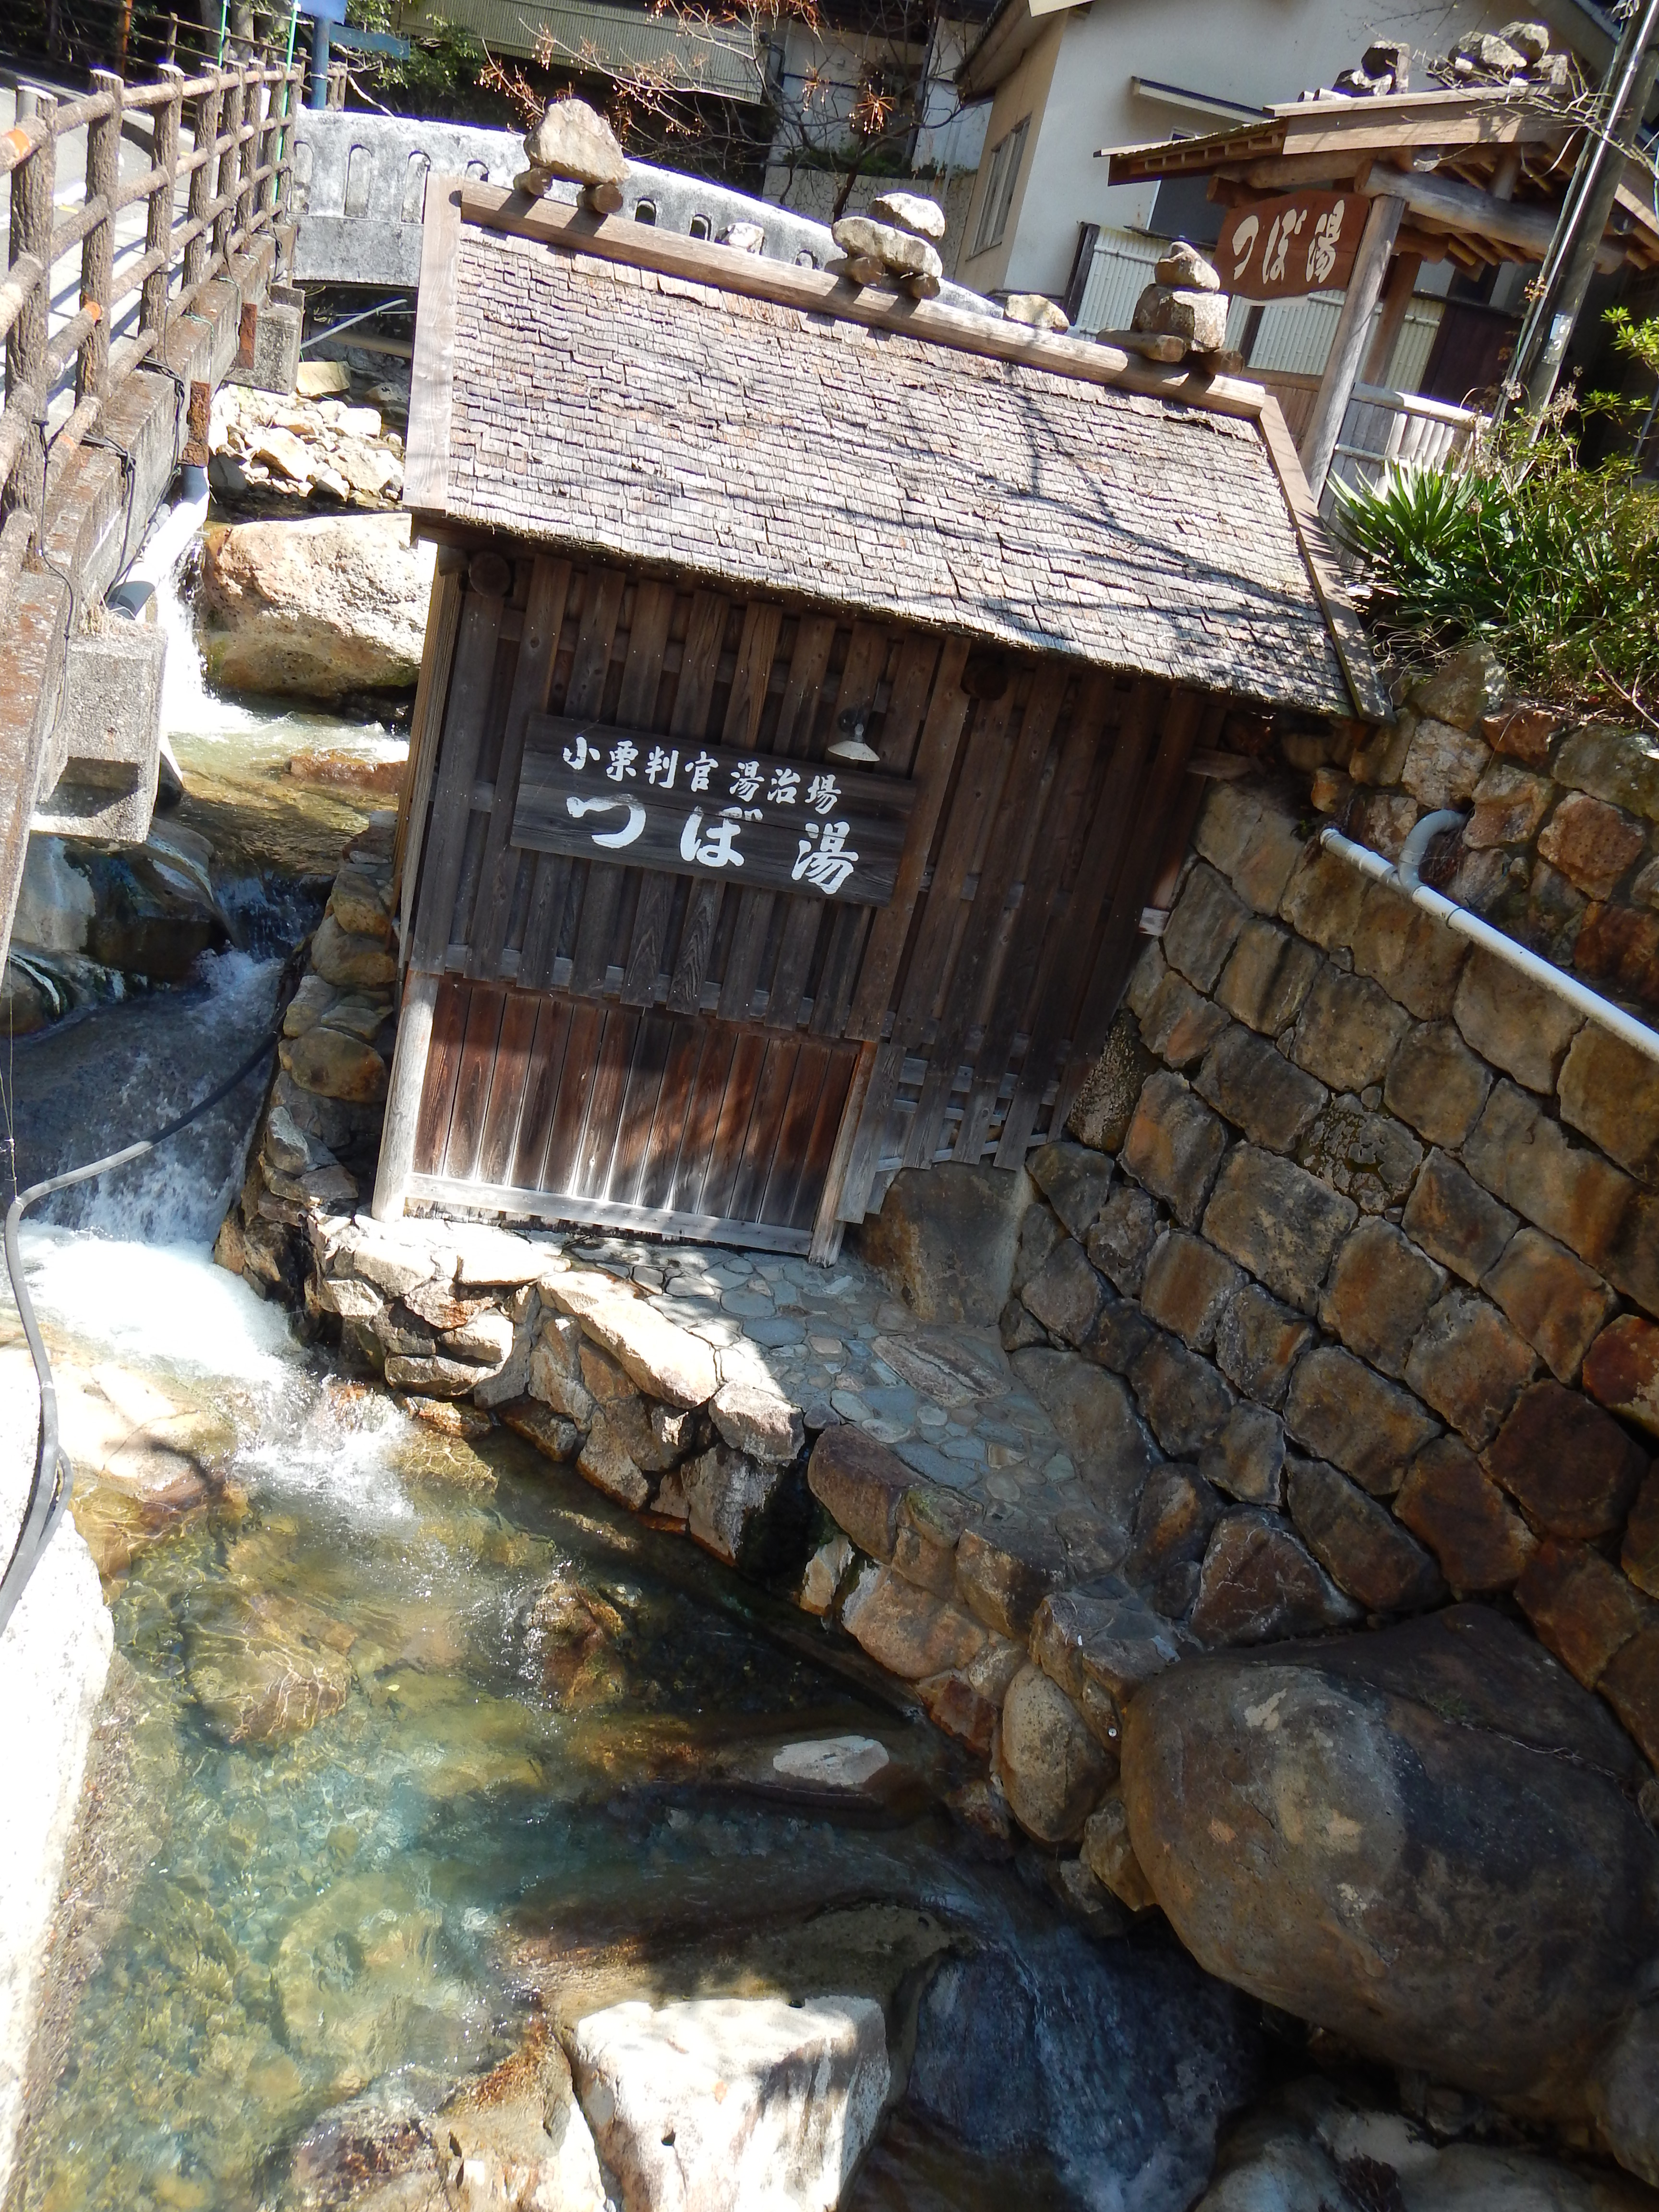 Kumano kodo pilgrimage route yunomine onsen world heritage %e7%86%8a%e9%87%8e%e5%8f%a4%e9%81%93 %e6%b9%af%e3%81%ae%e5%b3%b0%e6%b8%a9%e6%b3%89108